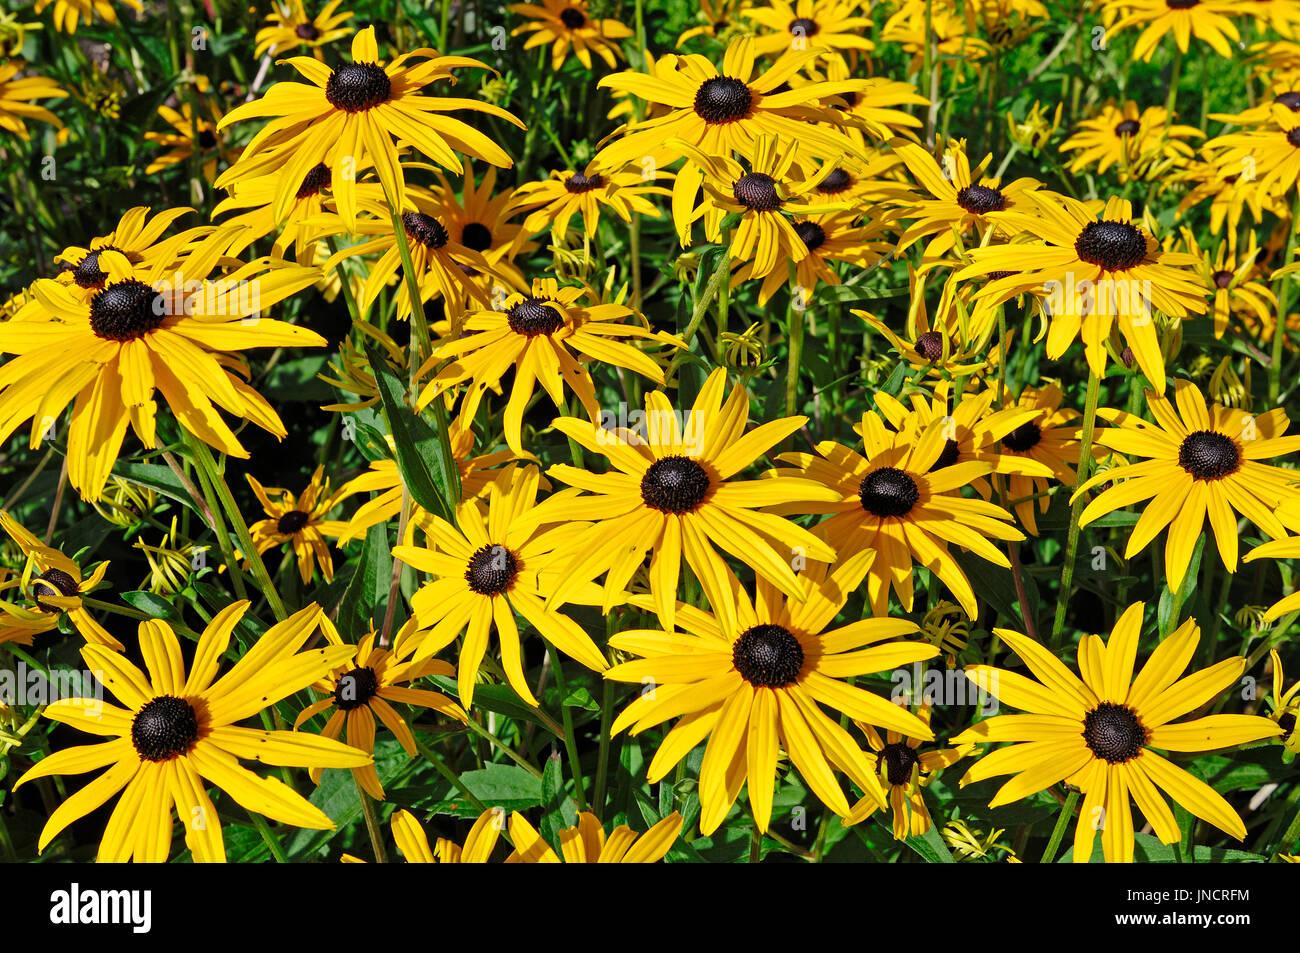 Black-eyed Susan / (Rudbeckia fulgida)   Sonnenhut / (Rudbeckia fulgida) - Stock Image